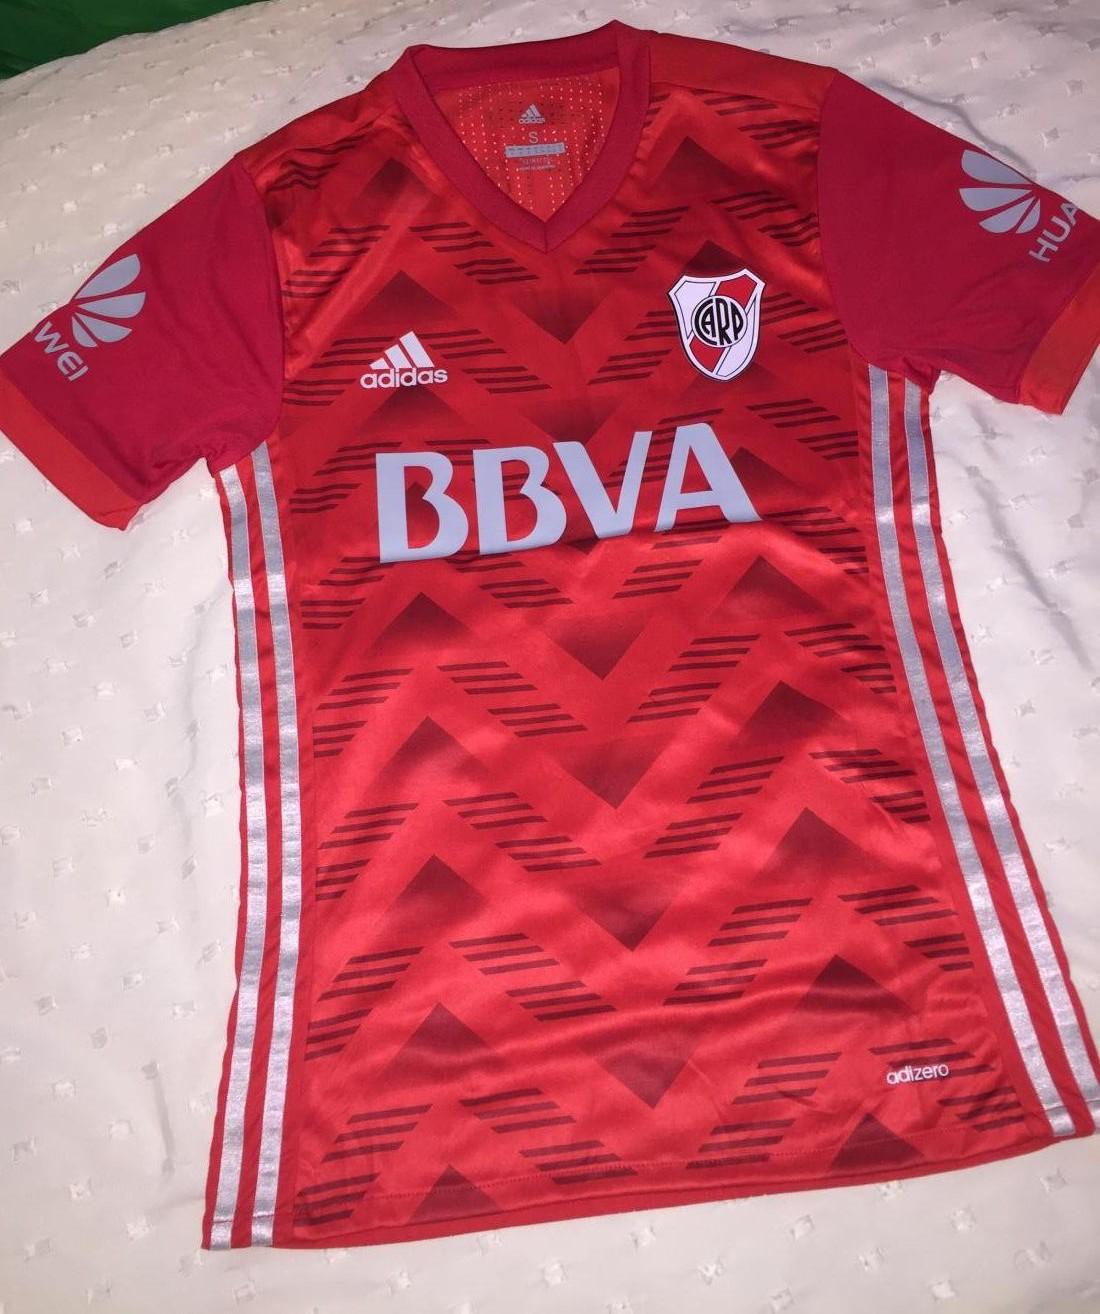 30242f769 River Plate Away camisa de futebol 2017 - 2018.